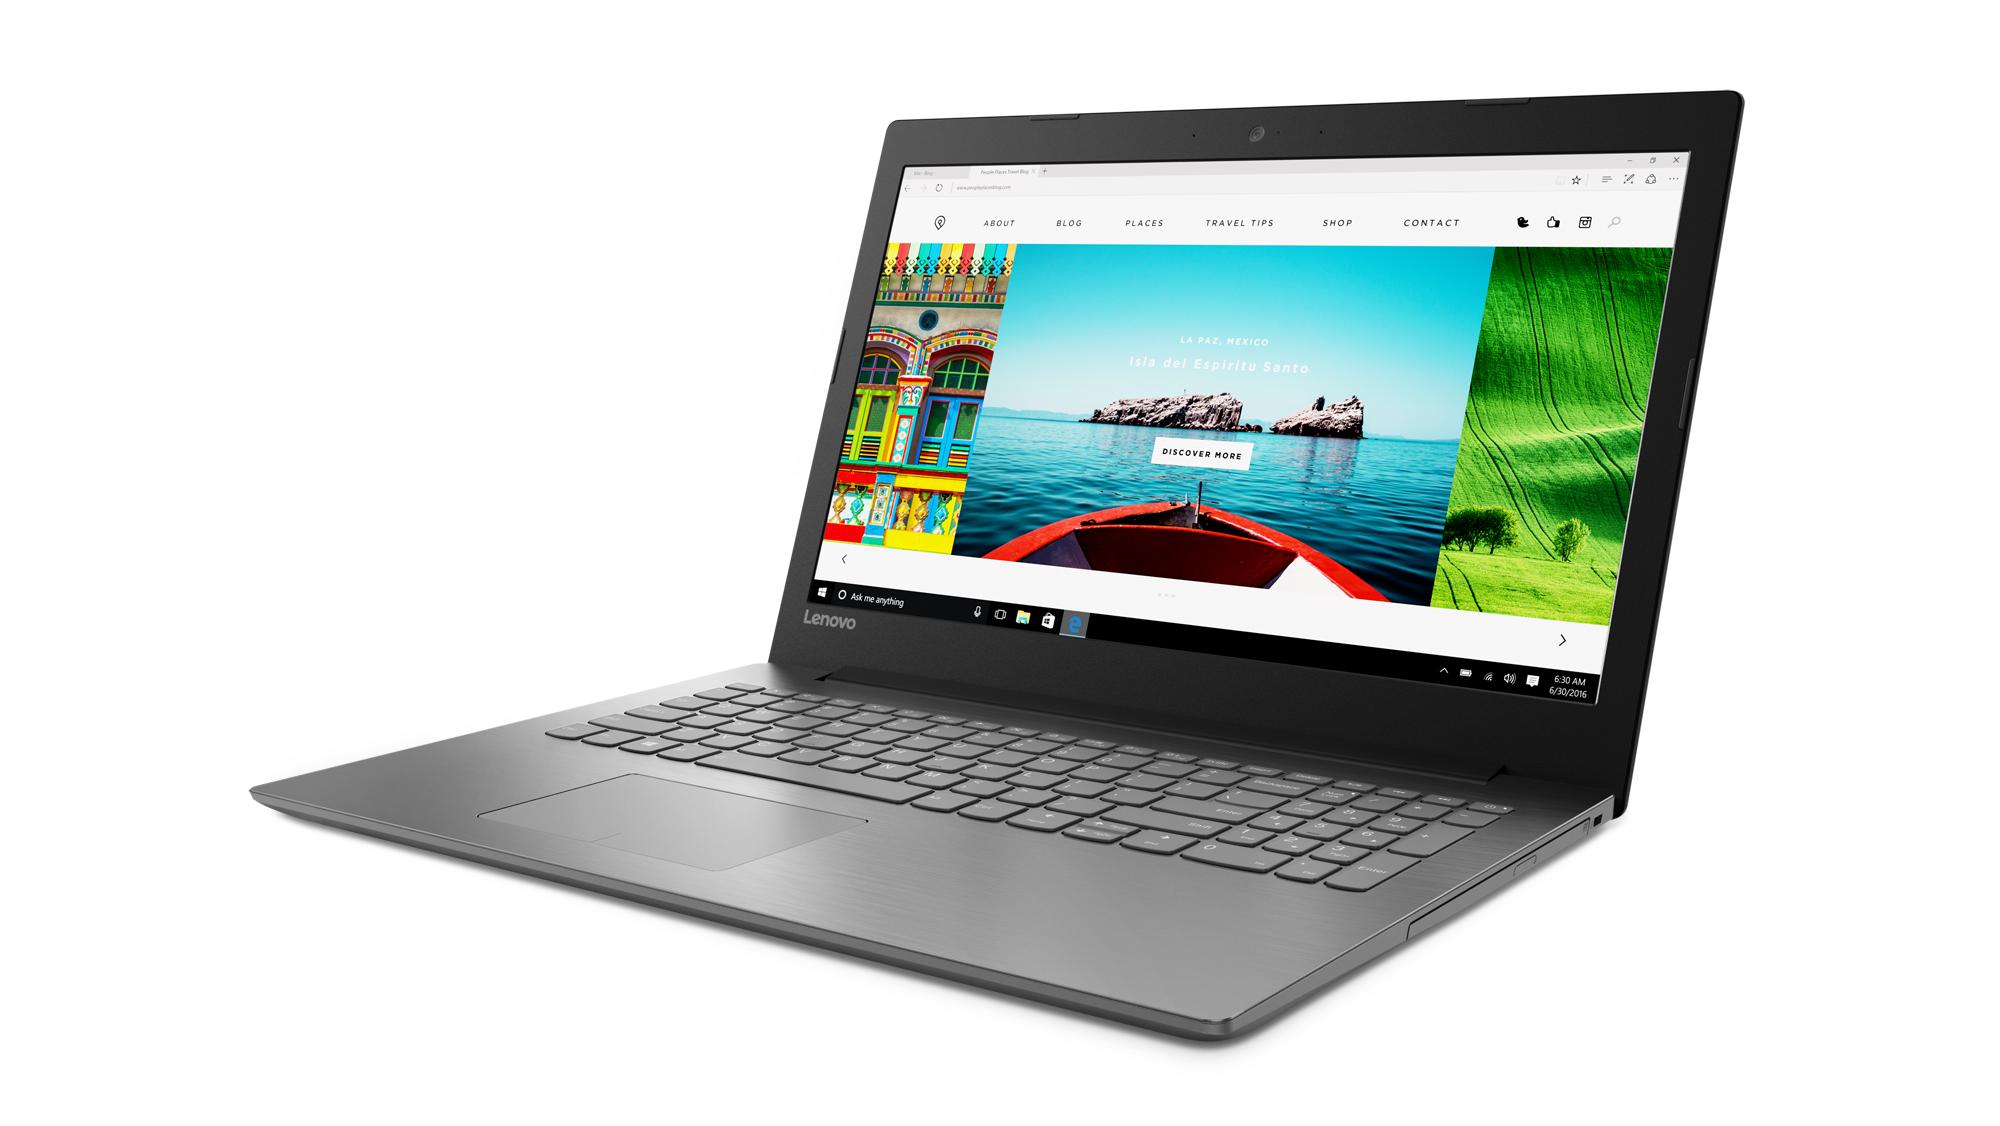 "Lenovo IdeaPad 320-15IKBN i5-7200U 3,10GHz/8GB/SSD 256GB/15,6"" FHD/AG/GeForce 4GB/DVD-RW/WIN10 černá 80XL007CCK"